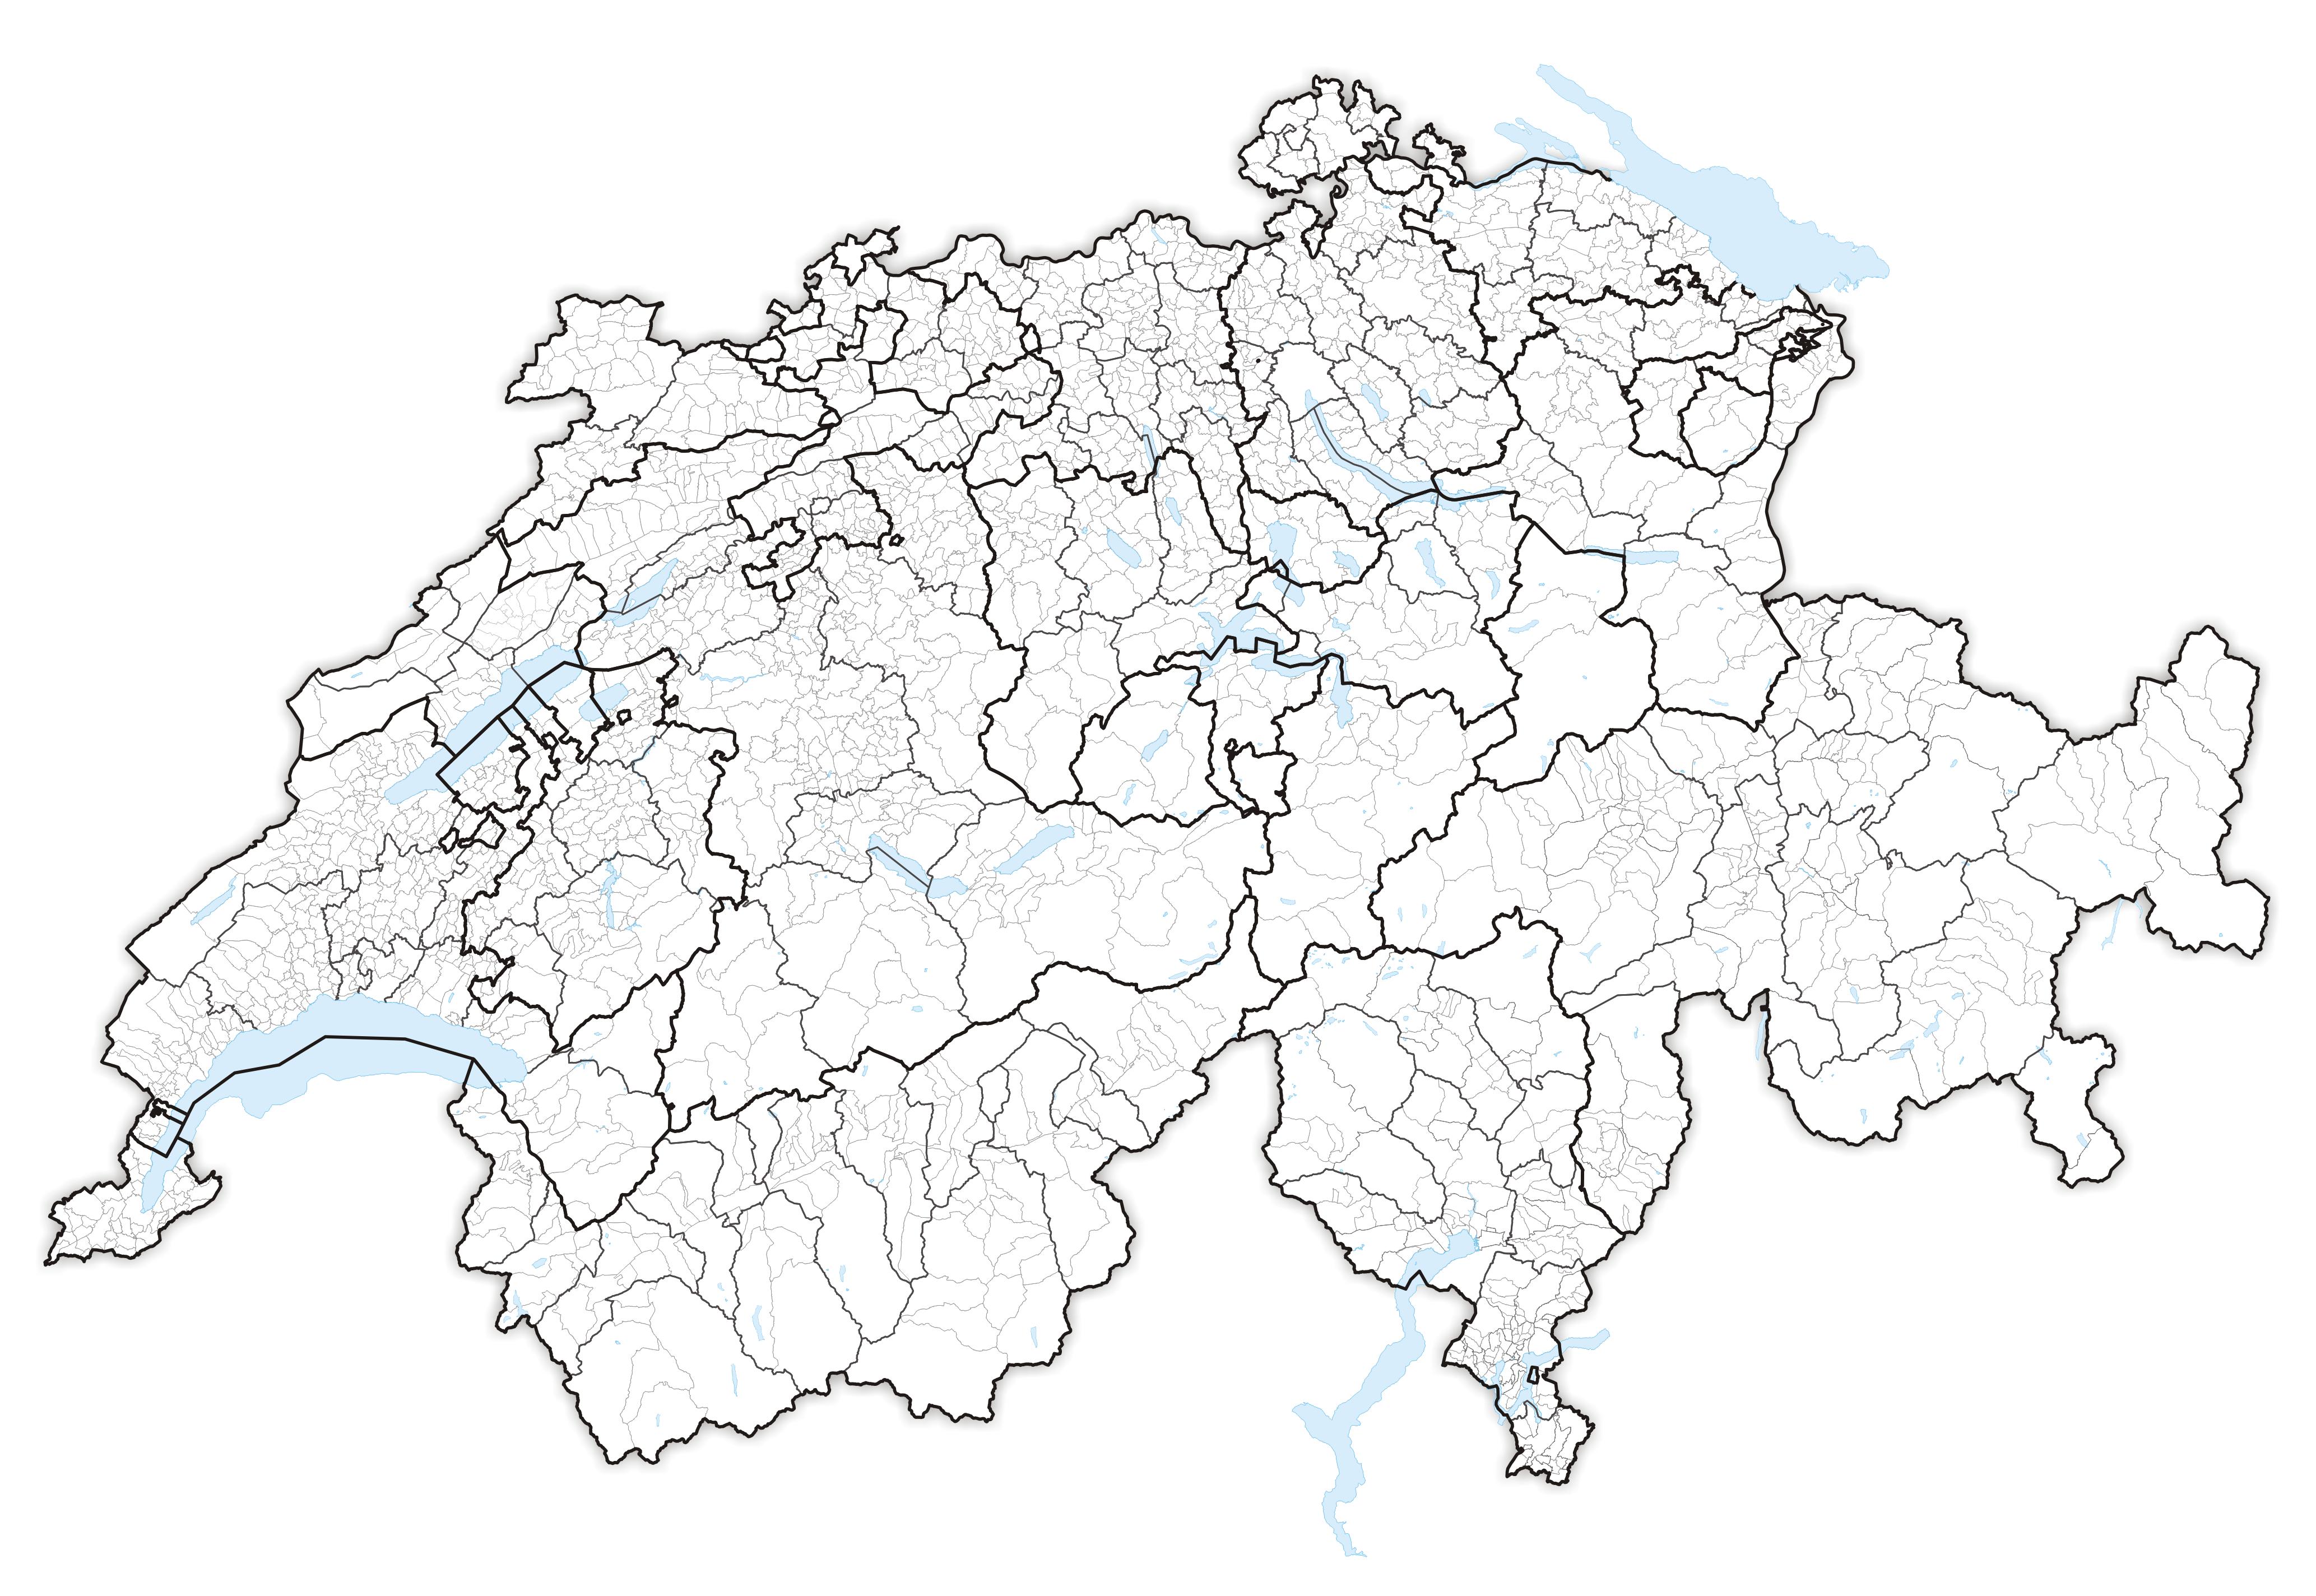 File:Karte Gemeinden der Schweiz 2011.07.01.png - Wikimedia Commons KARTE SCHWEIZ